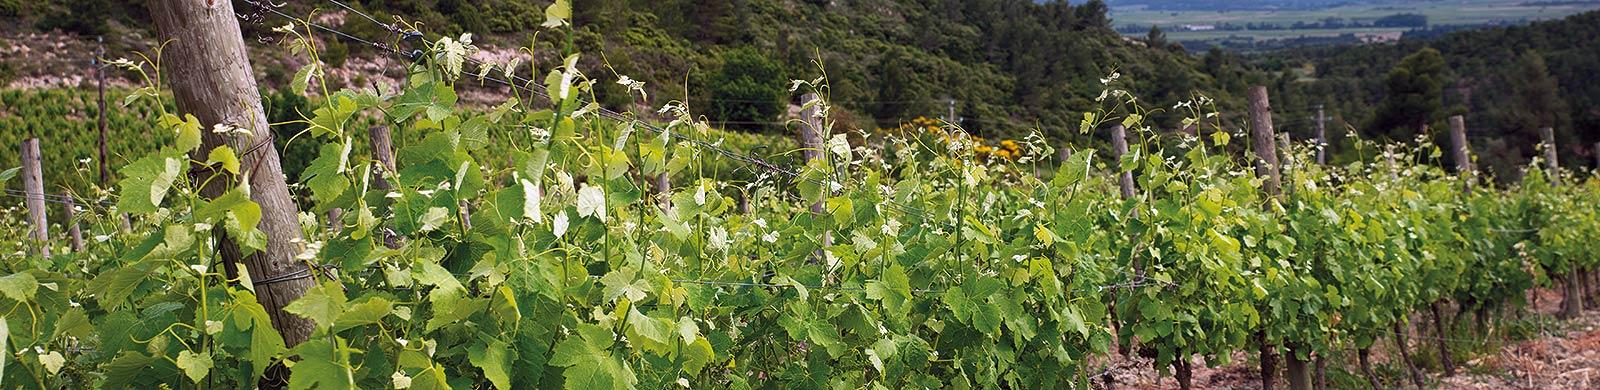 Domaine de cantaussel Minervois